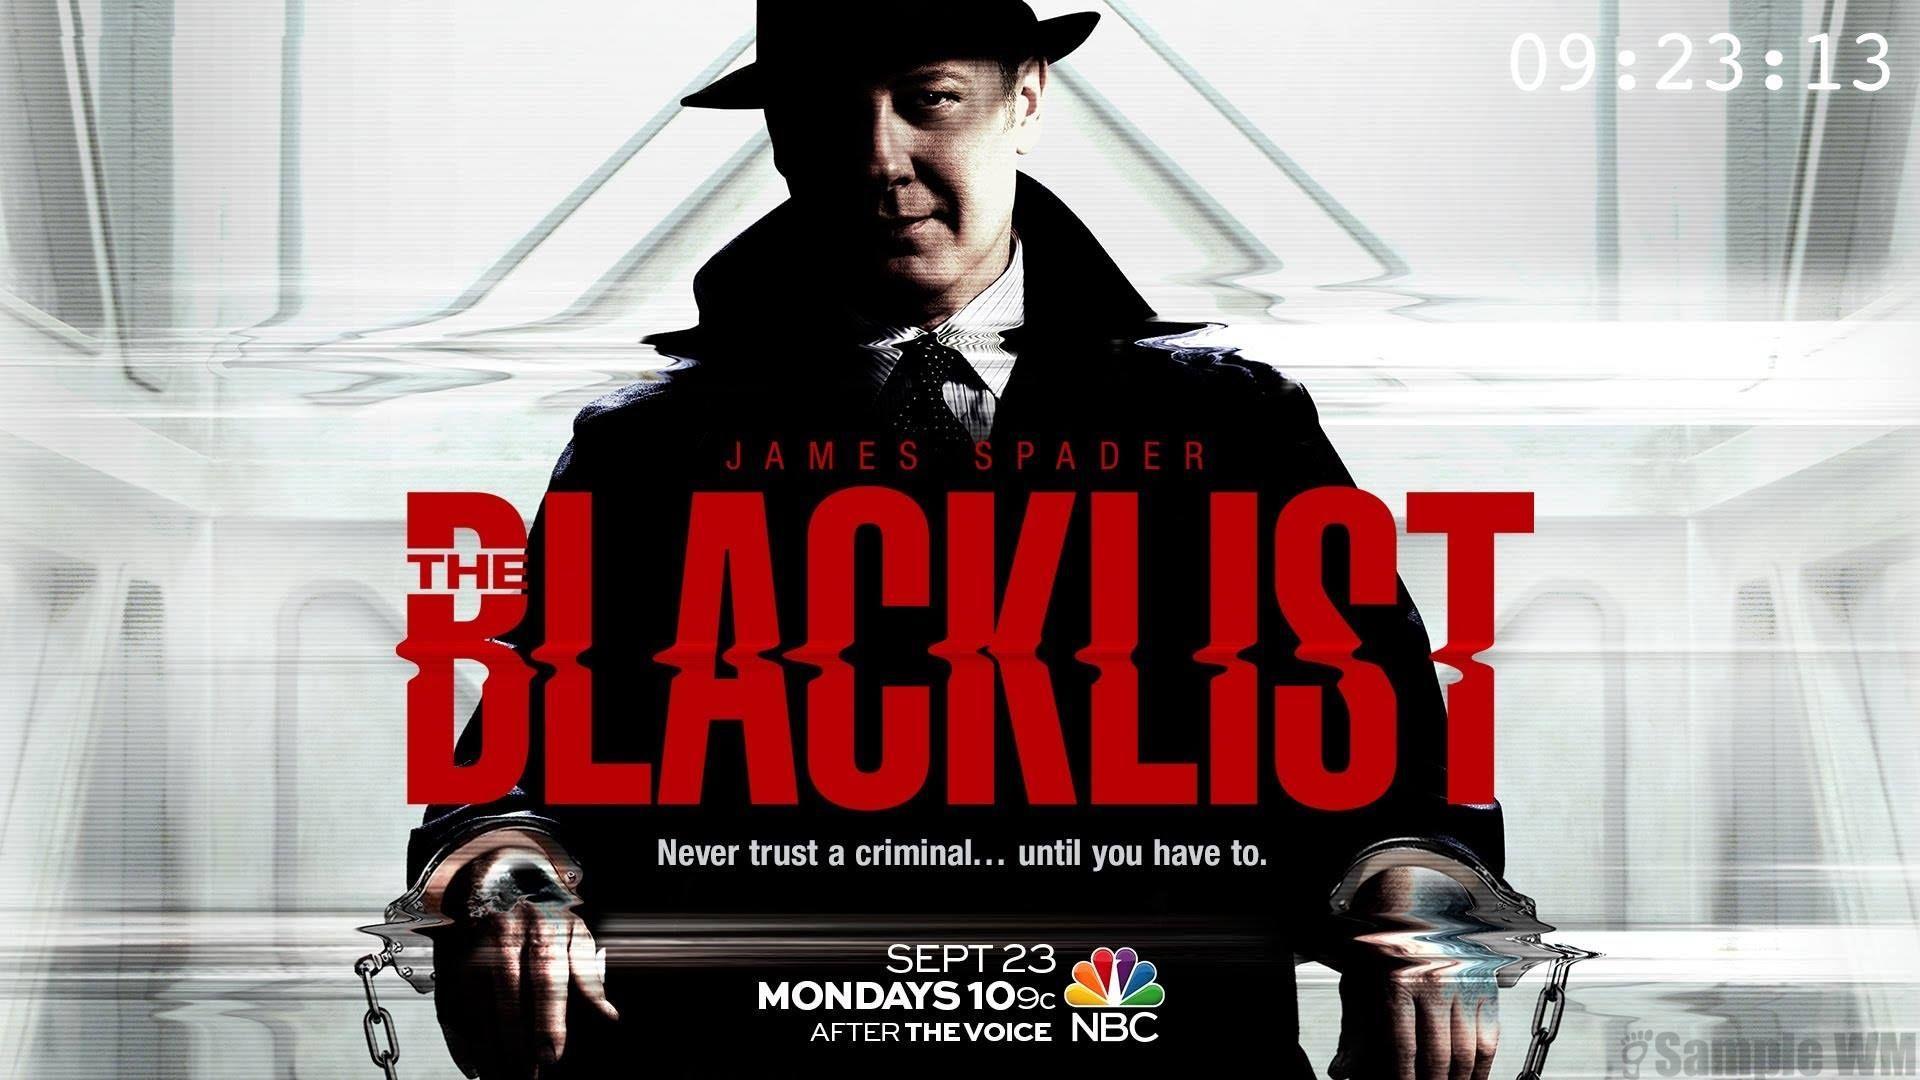 [影集] The Blacklist (2013~) The-Blacklist-the-blacklist-35676705-1920-1080